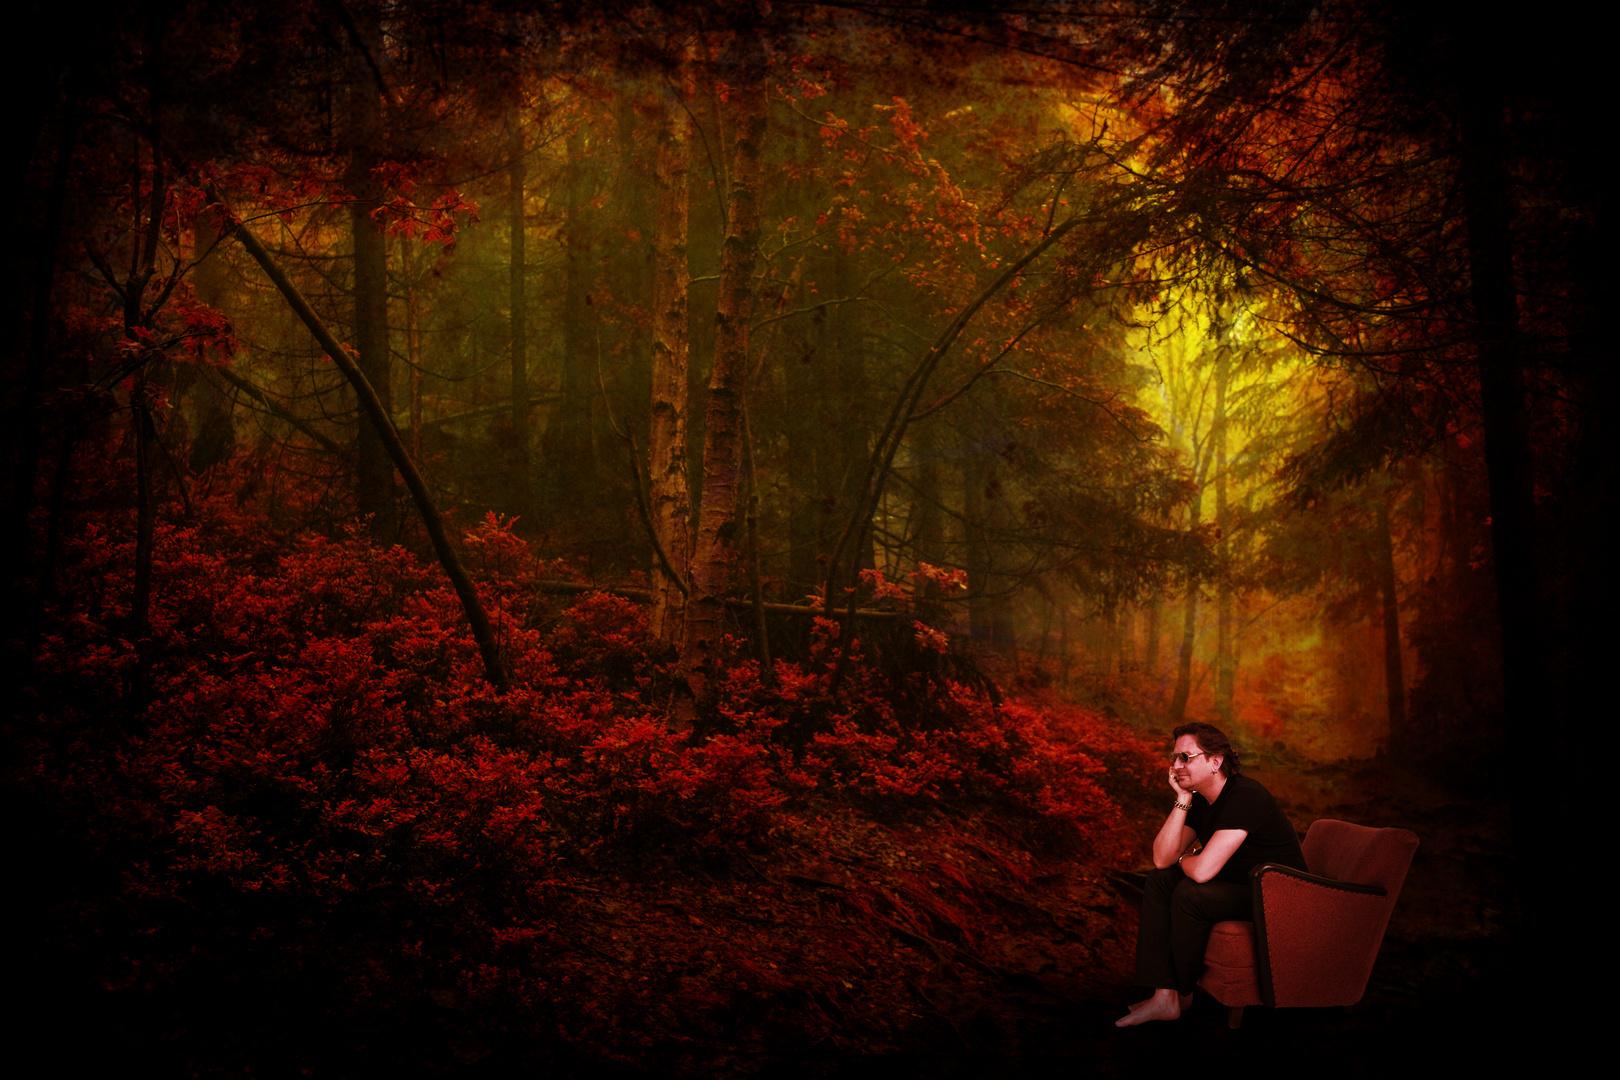 Thomas im Wald